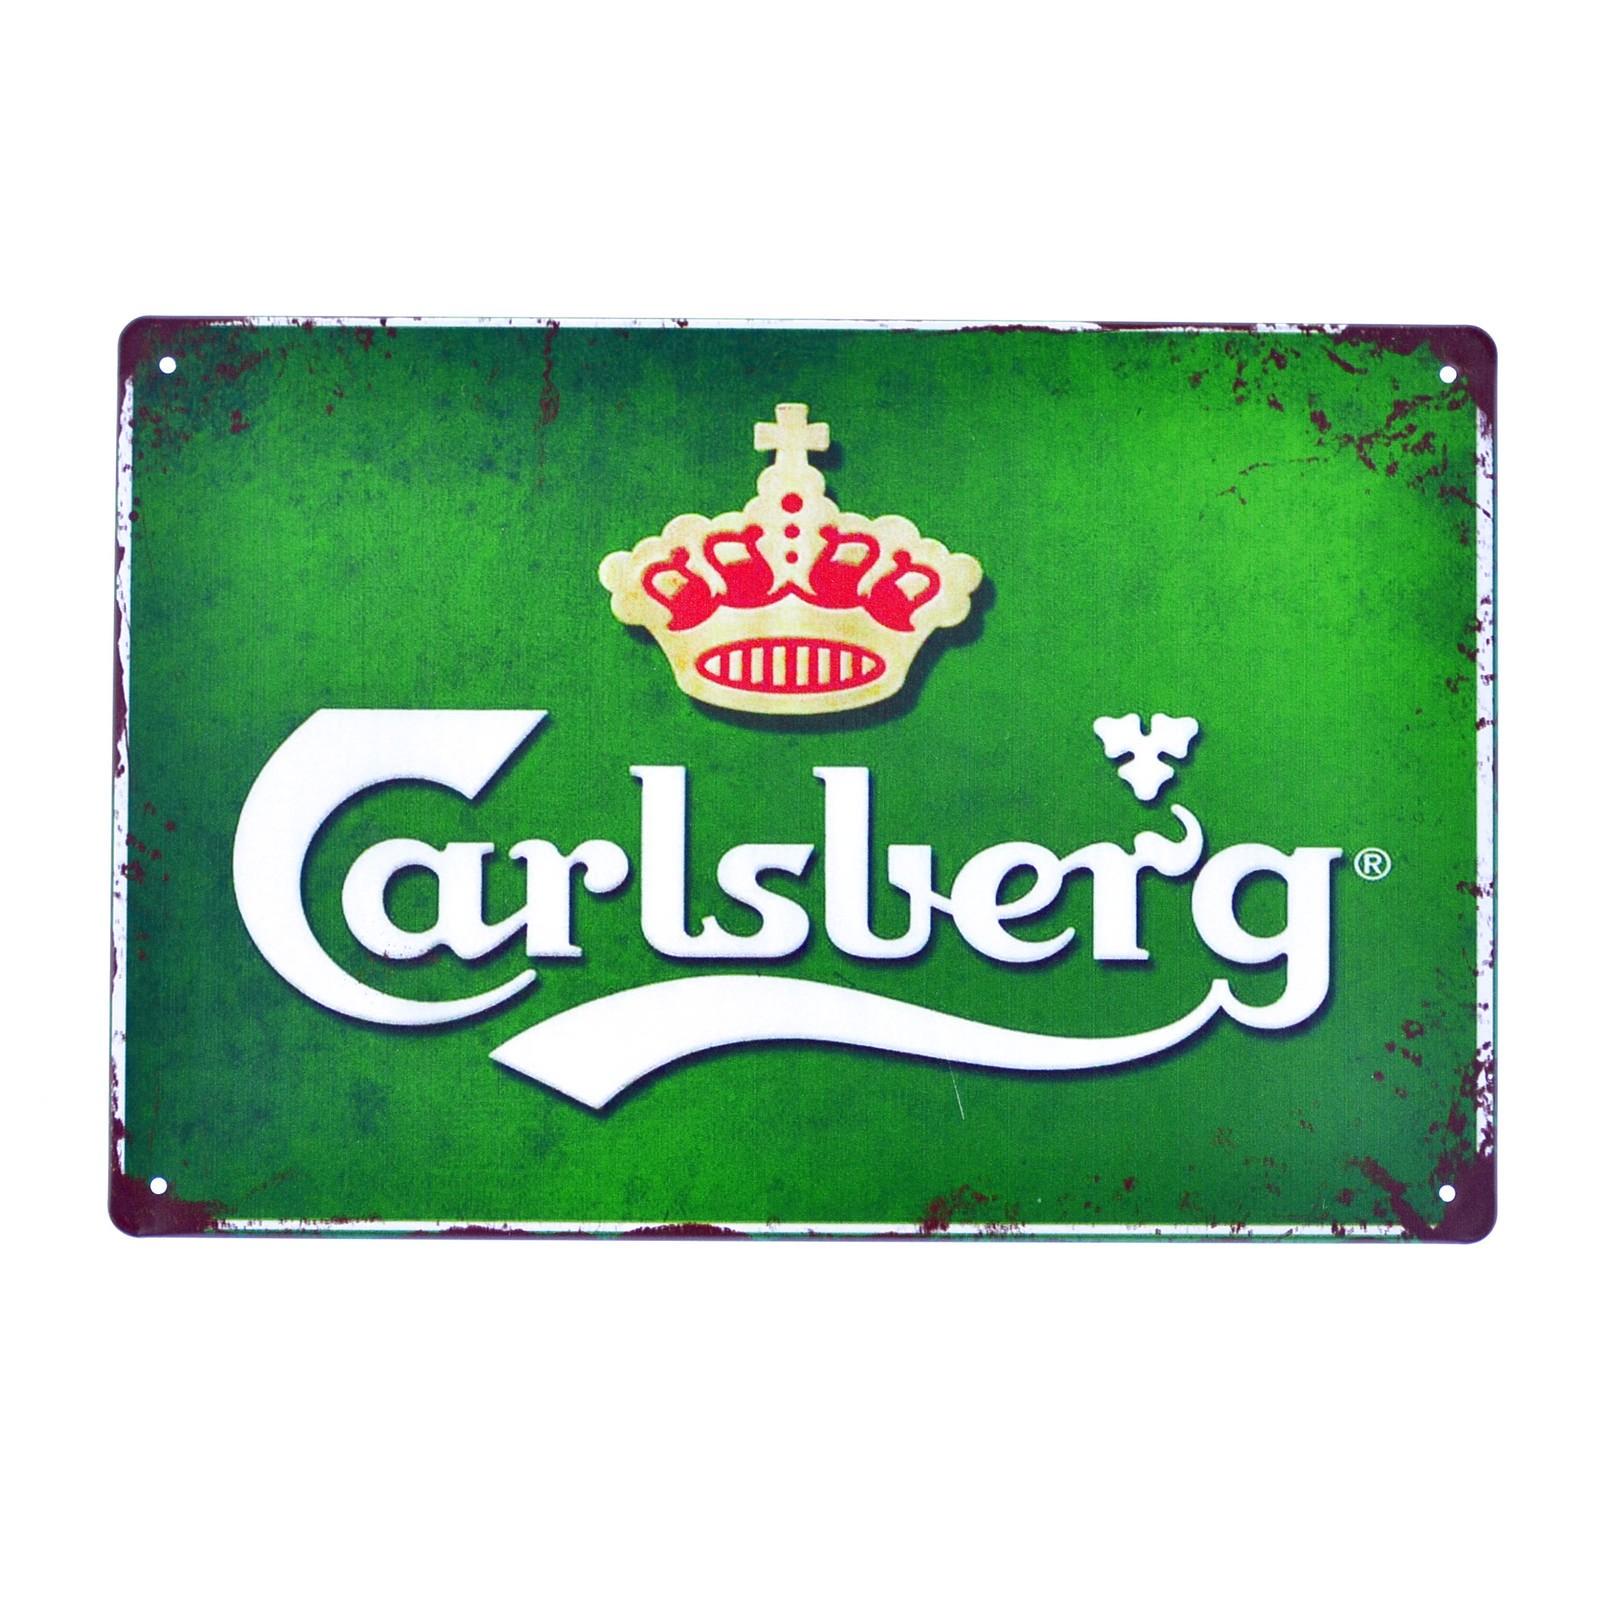 Cartel Metálico de Carlsberg